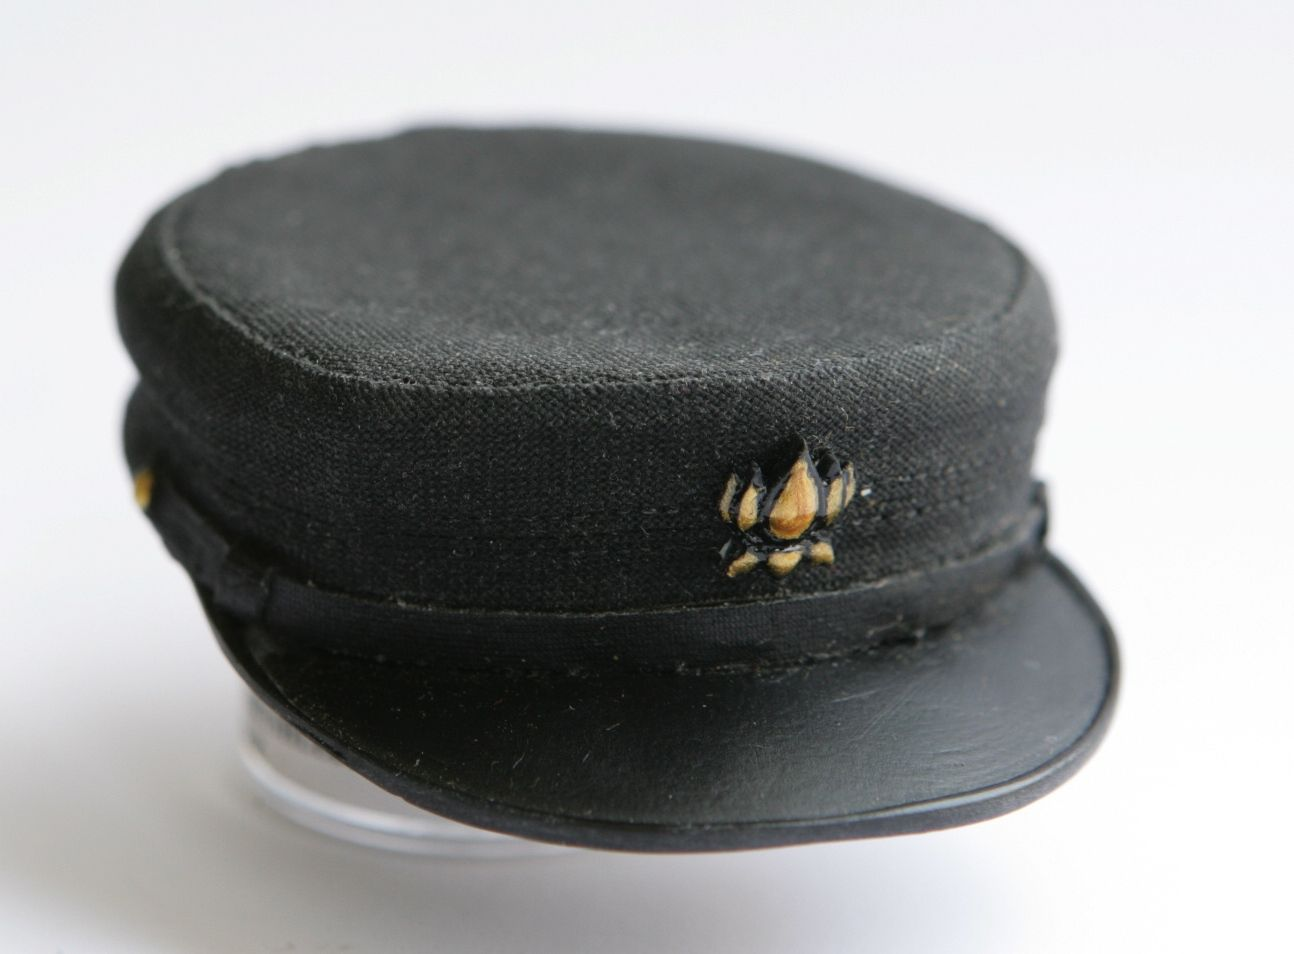 Thebreadsmasher Coraline S Military Hat Full Size Prop Coraline Coraline Aesthetic Coraline Jones